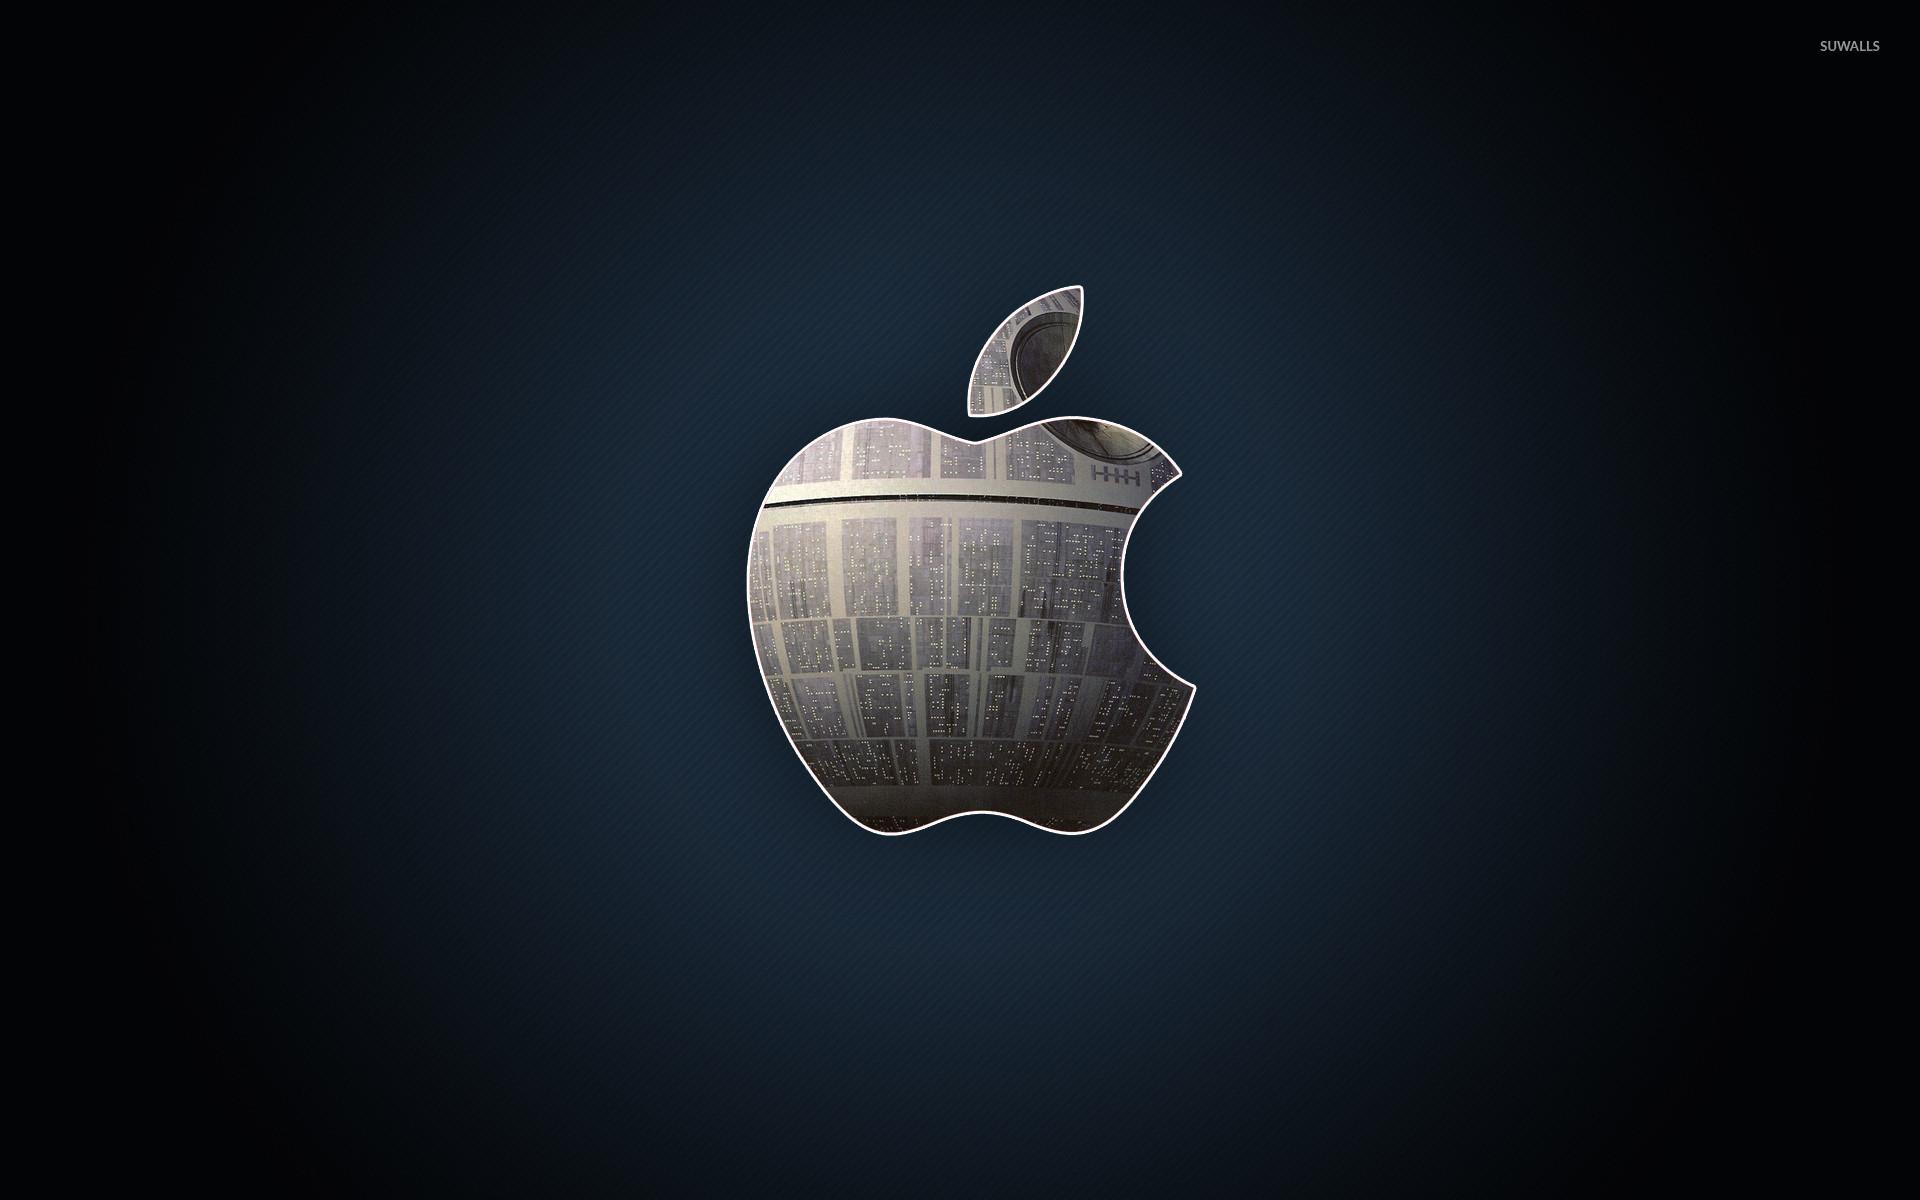 Apple Metal Glow Retina Wallpaper Apple iPad Forum